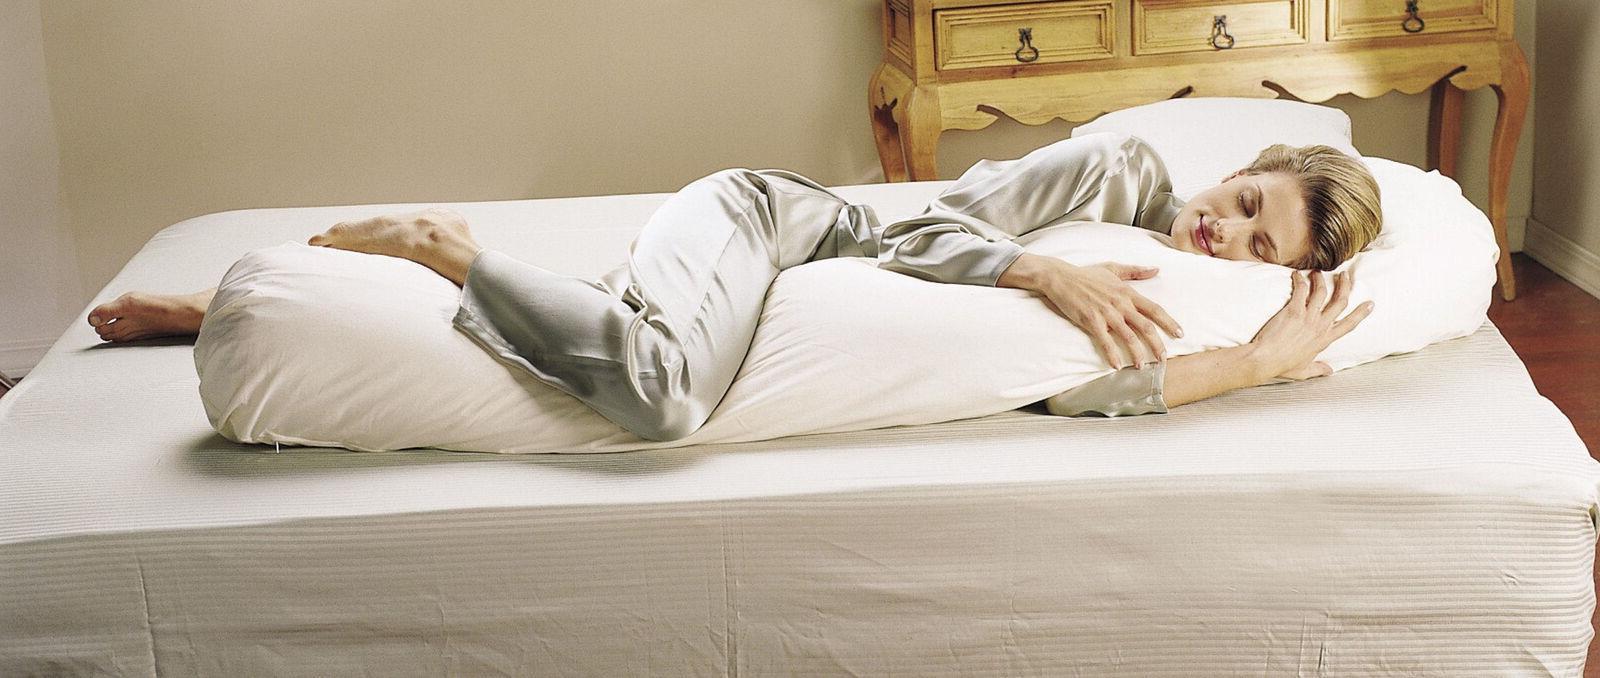 sleeping bean body pillow cover cotton zippered